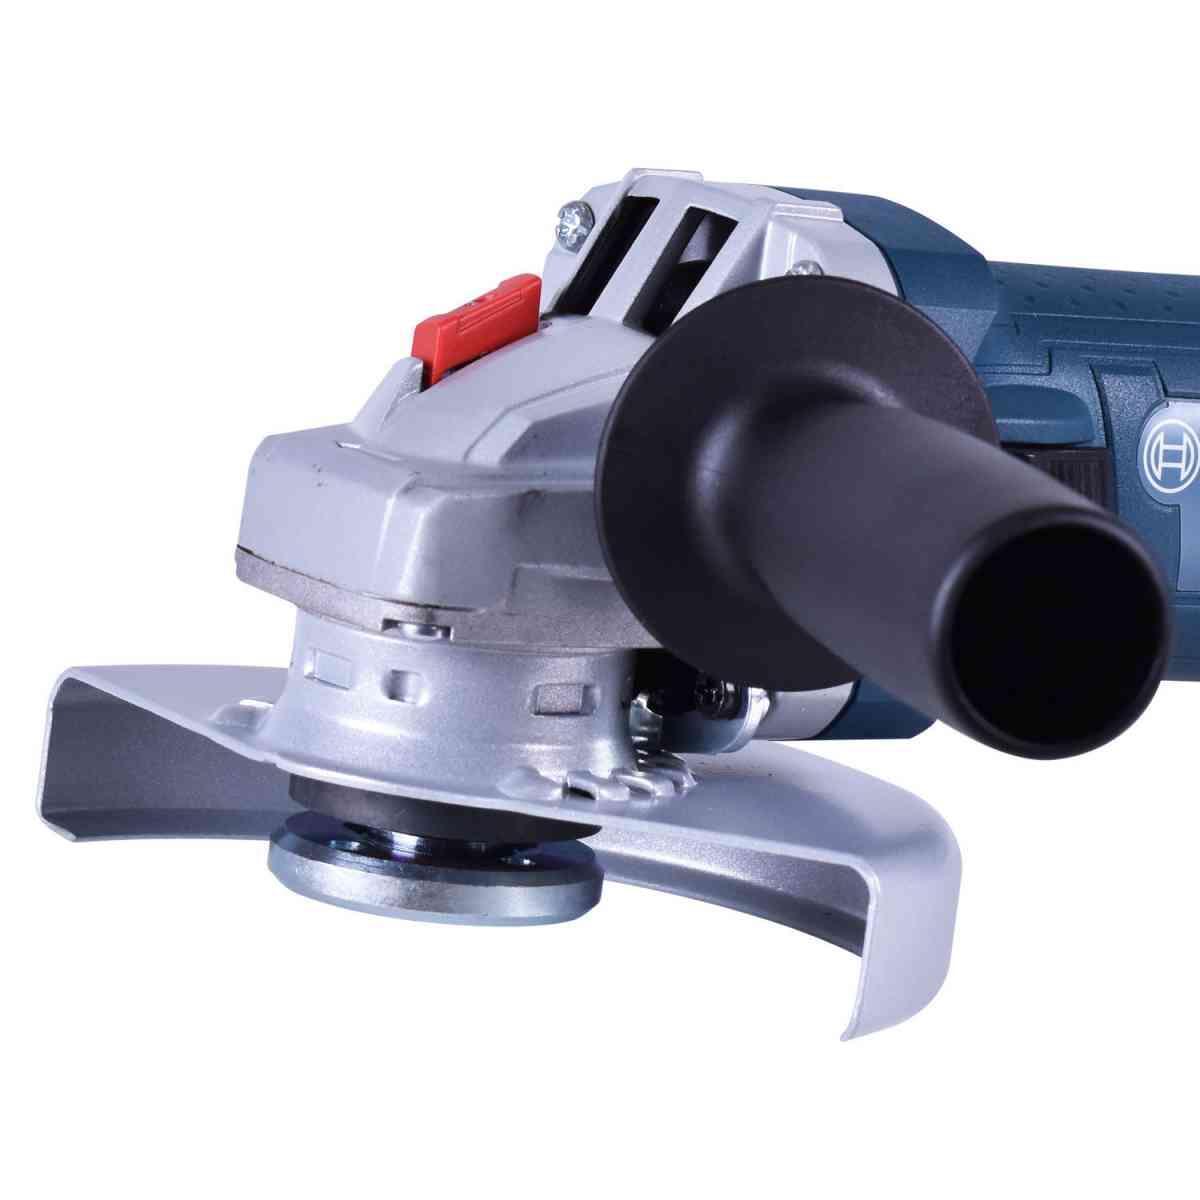 Esmerilhadeira Angular 900W Modelo GWS 9-125S Bosch – 220V